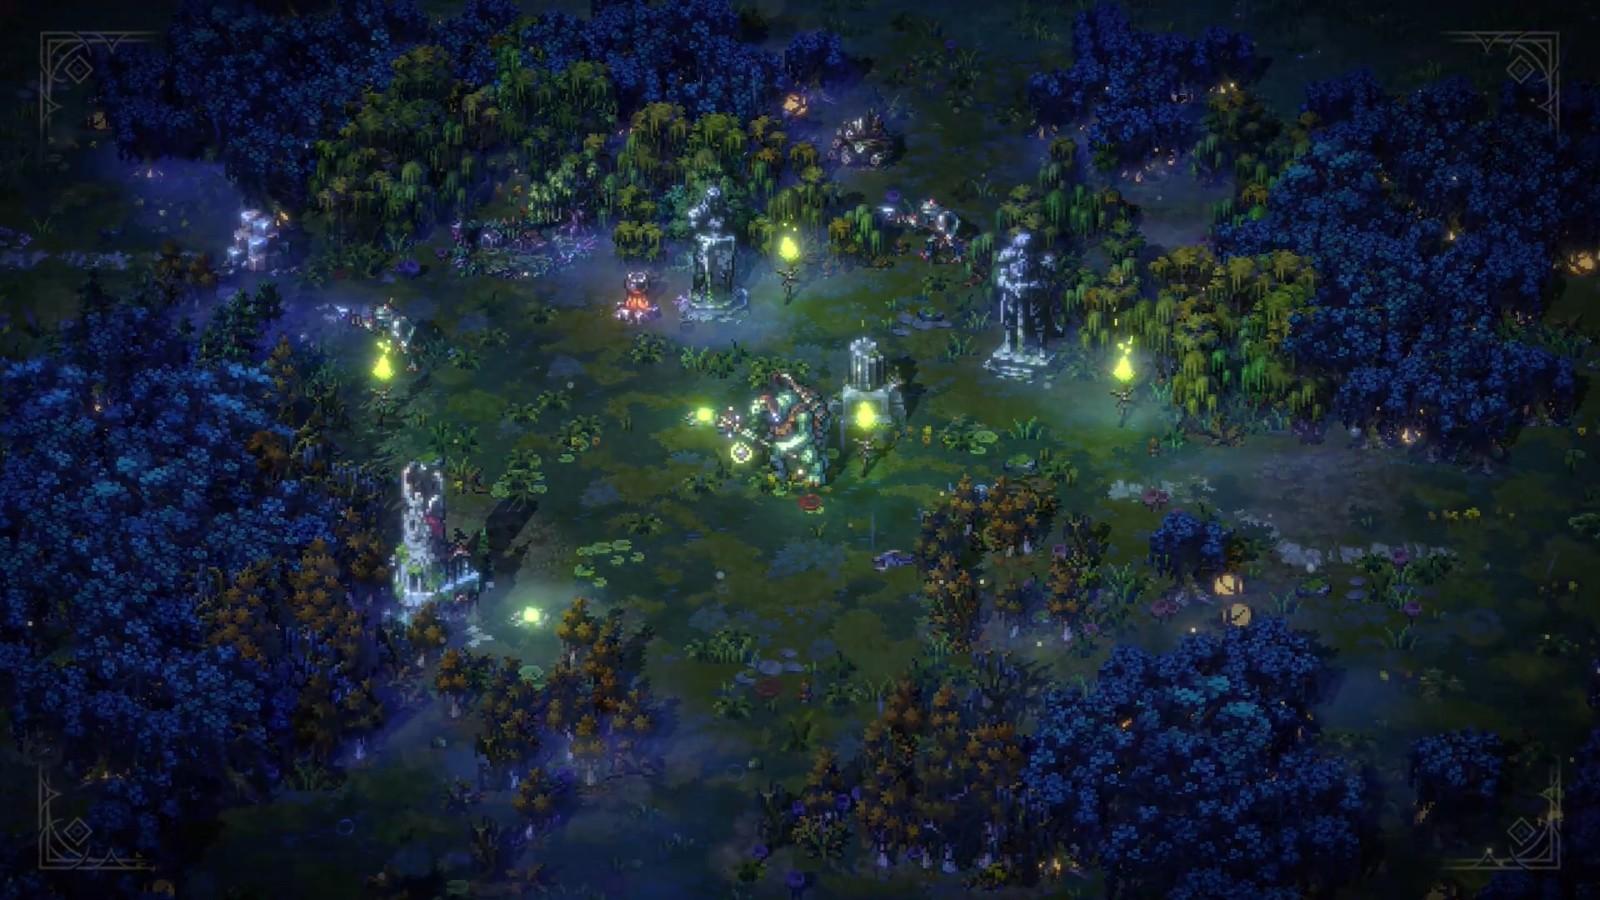 E3:回合战略游戏《征服之歌》实机演示 2022年发售